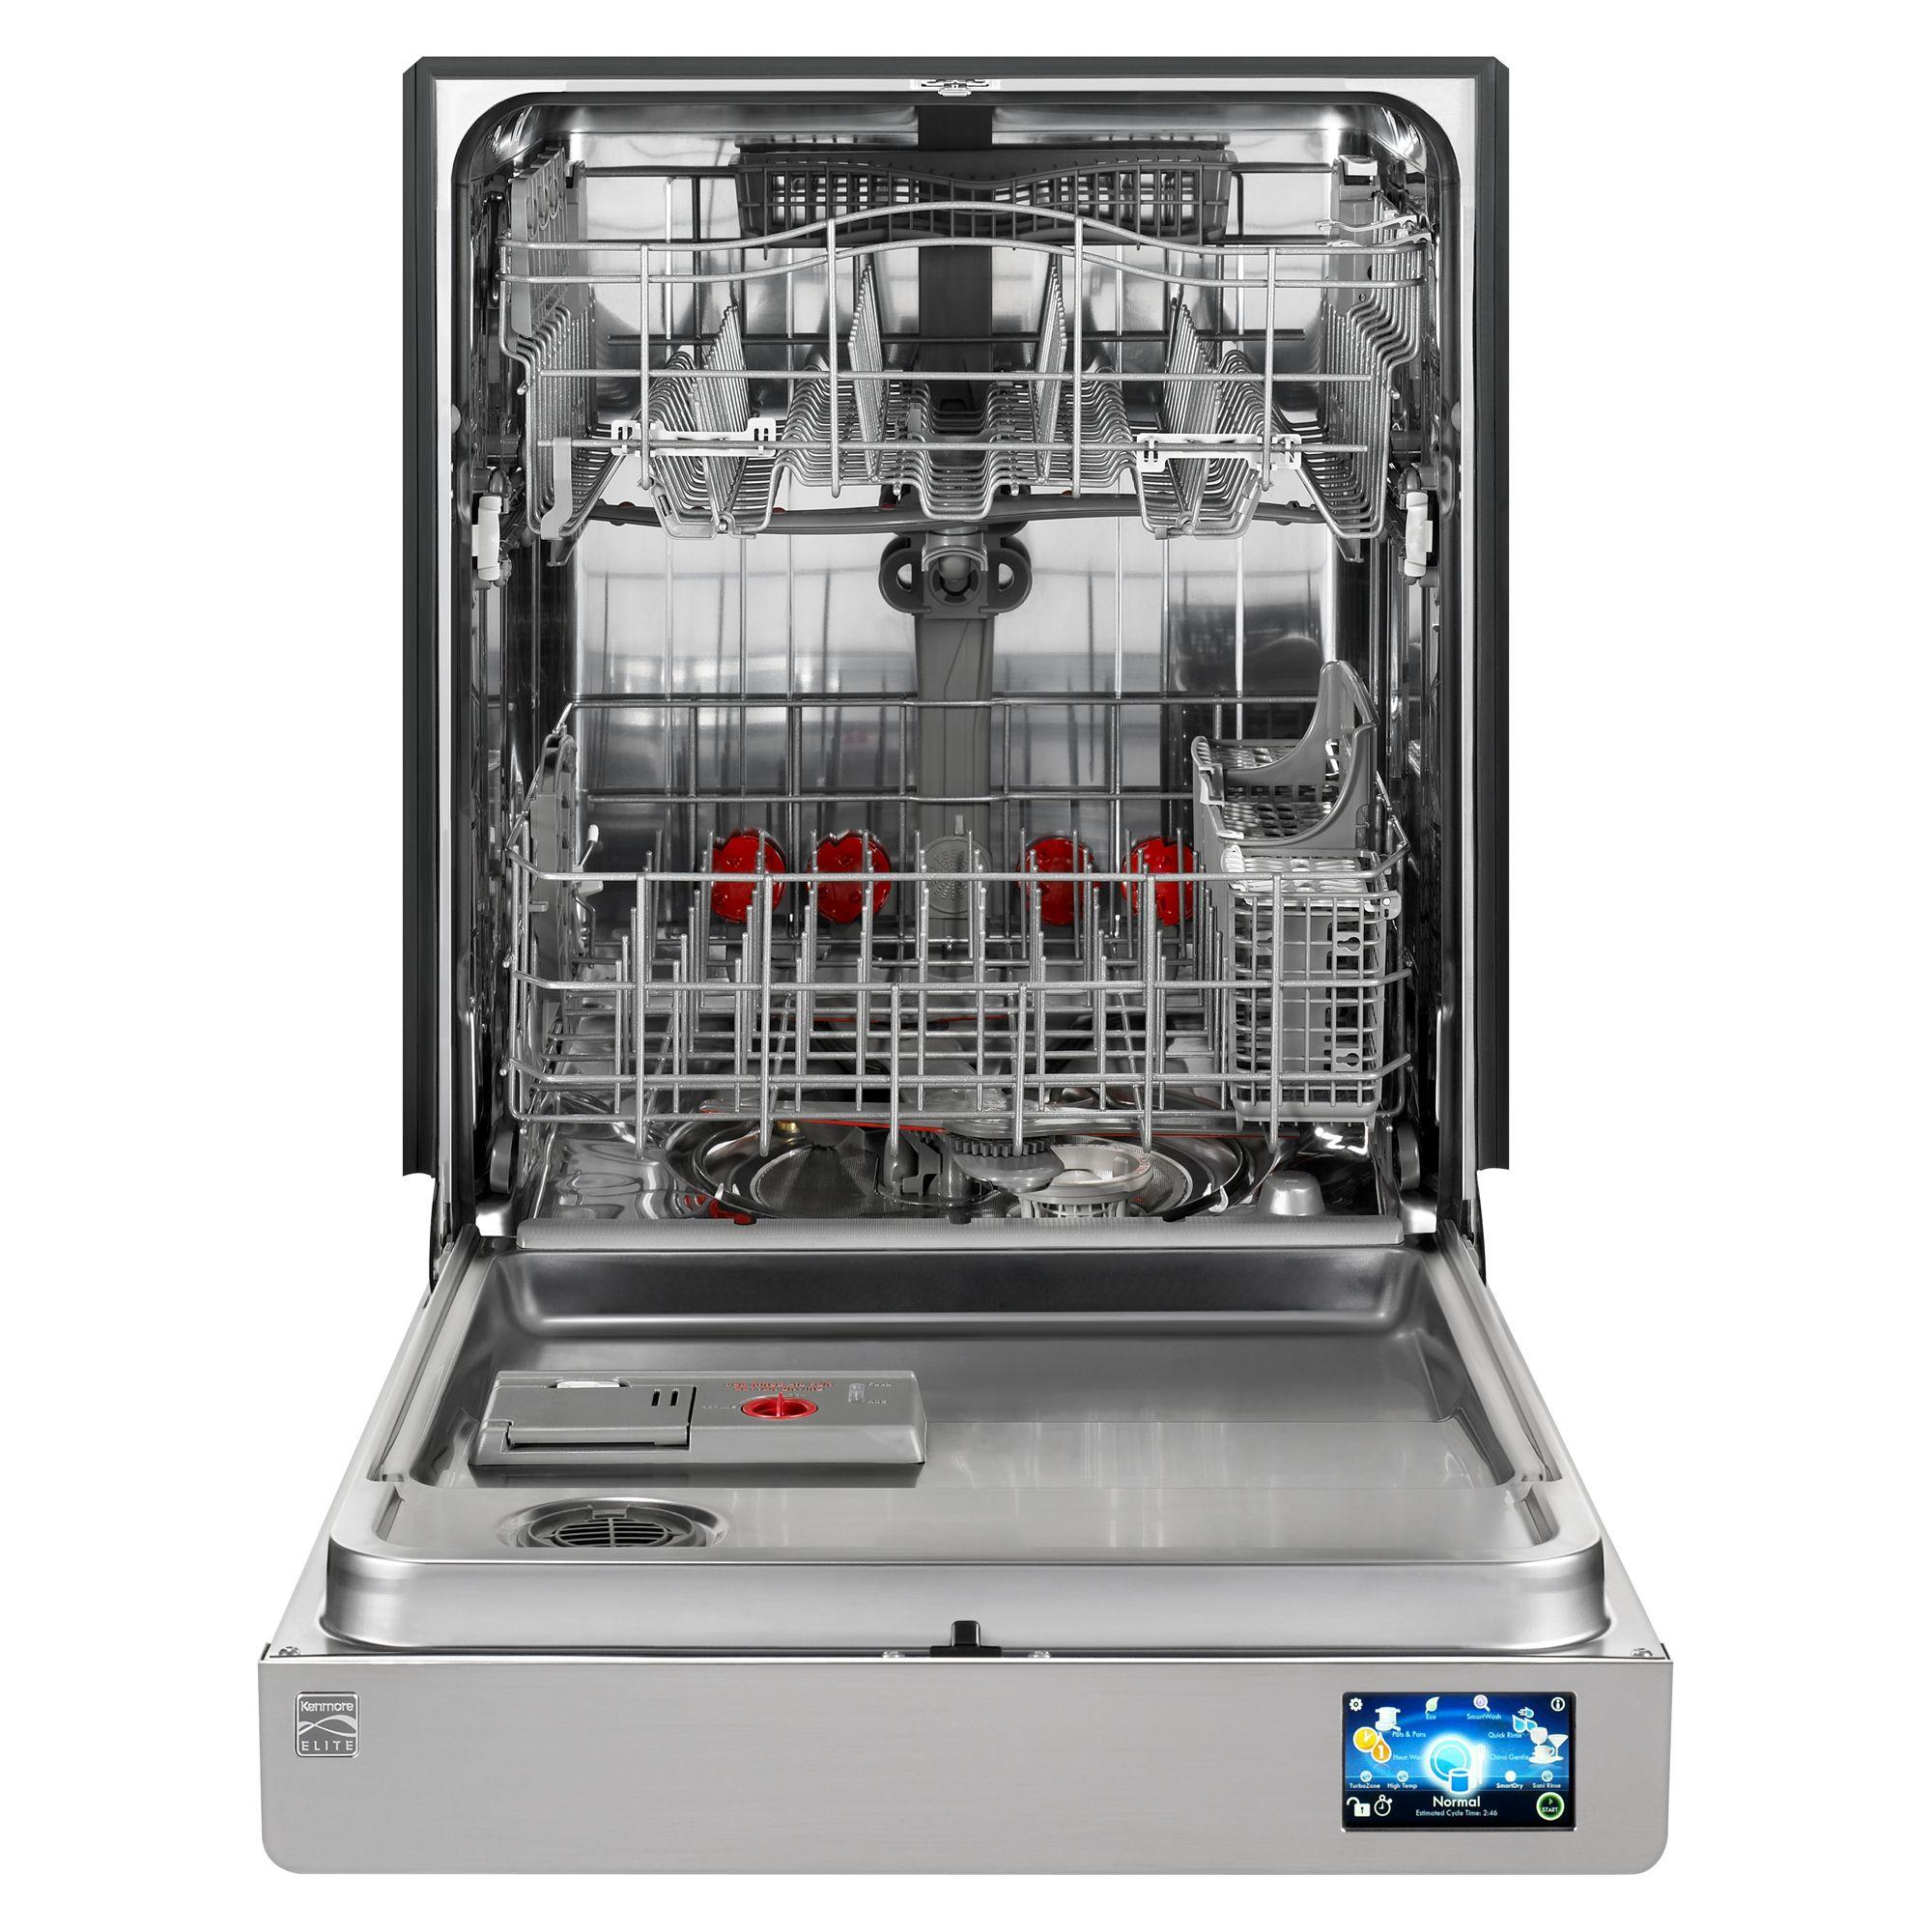 "Kenmore Elite 24"" Built-In Dishwasher,  Stainless Steel"